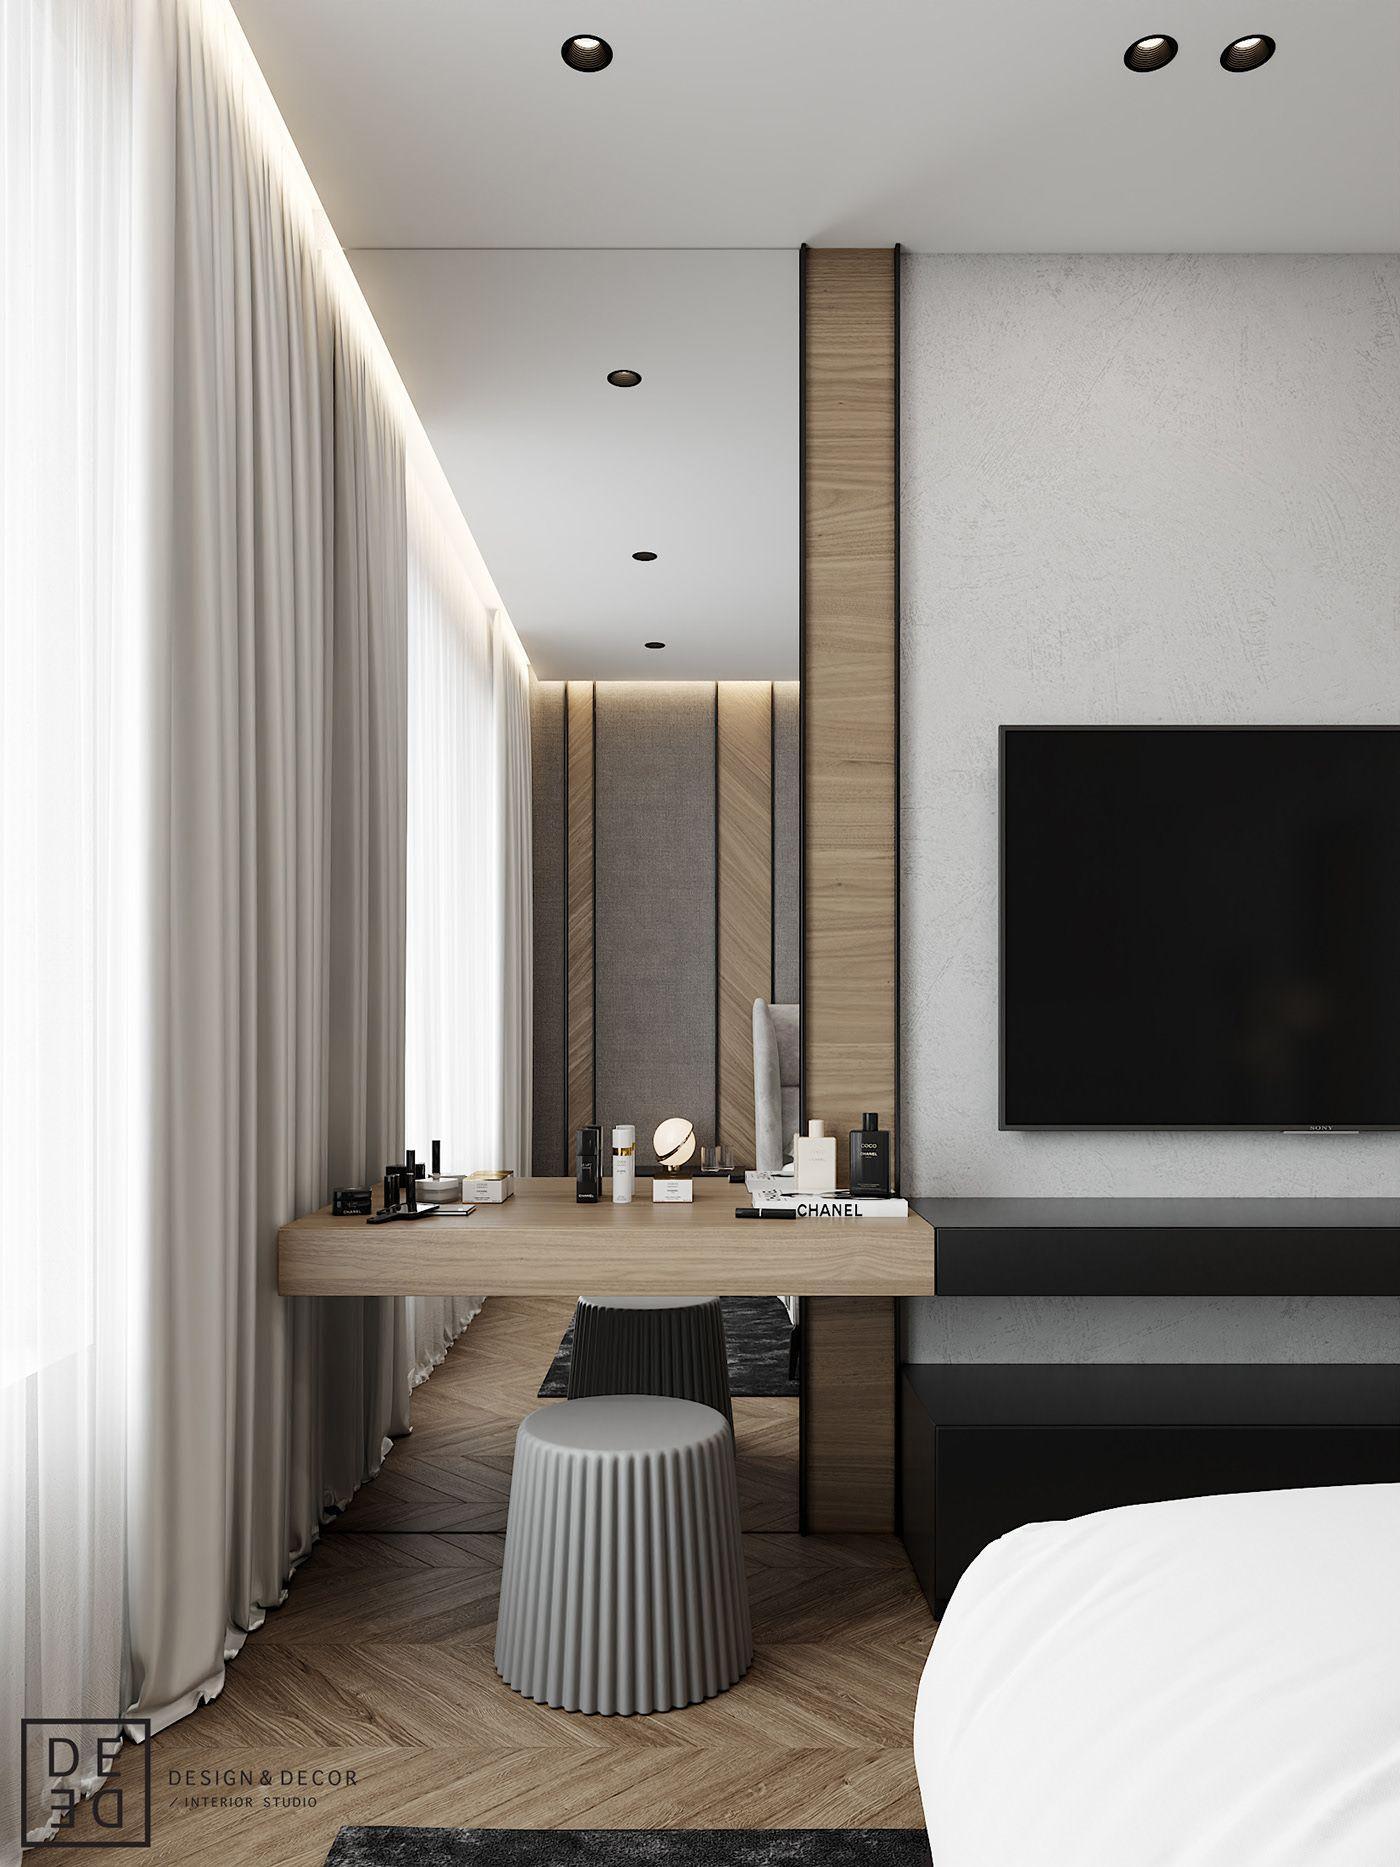 DE&DE/Eco minimalism apartment on Behance Hotel room